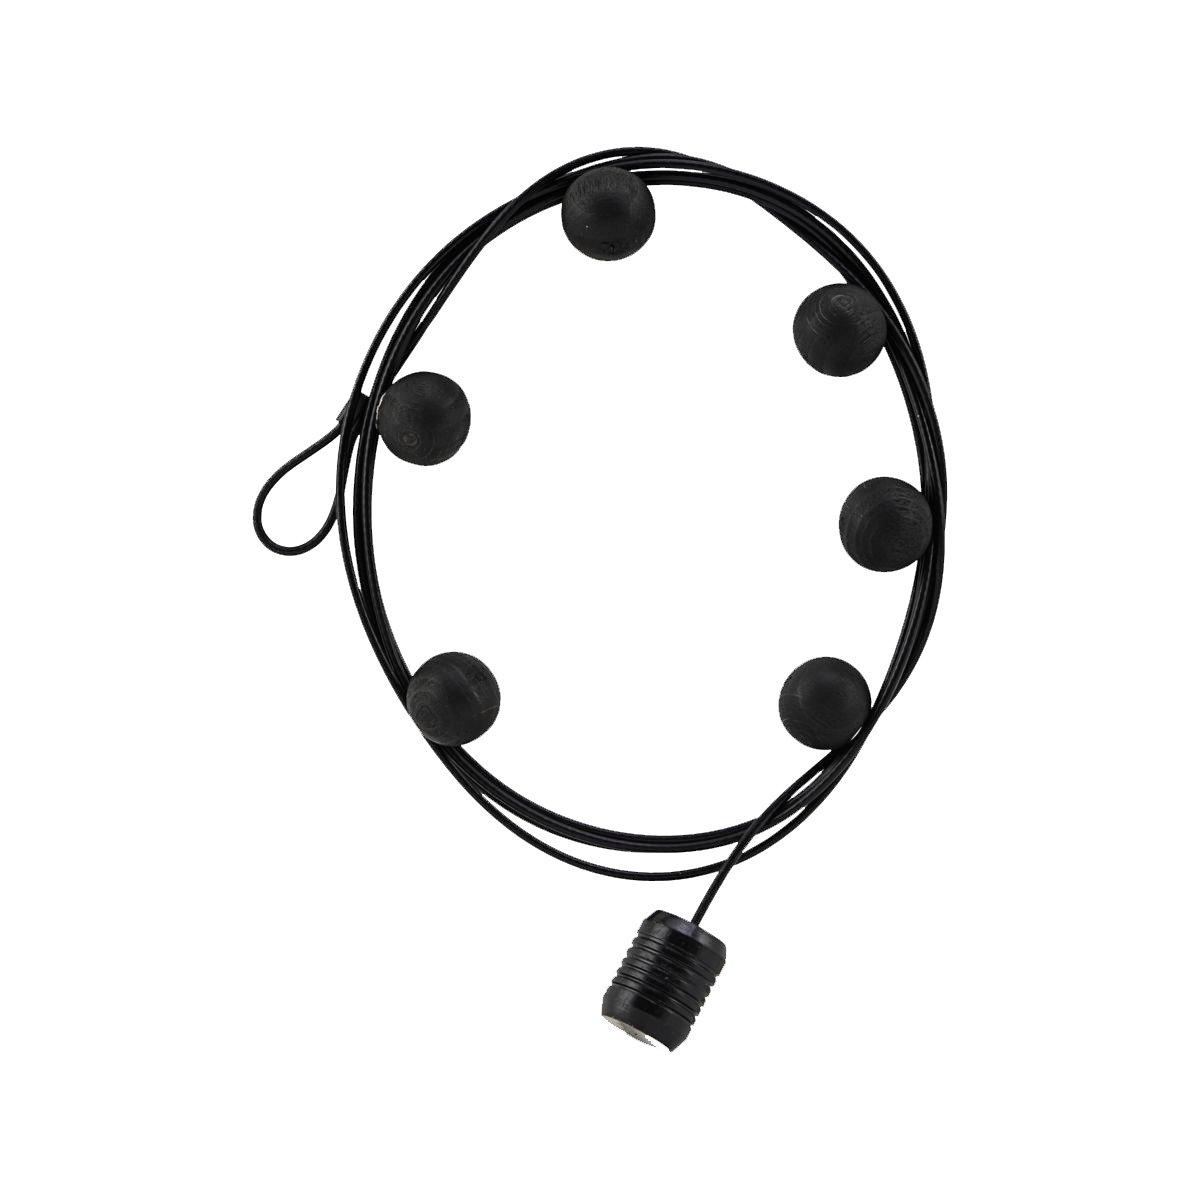 House Doctor - Photo Kabel Display - Black (409470050)